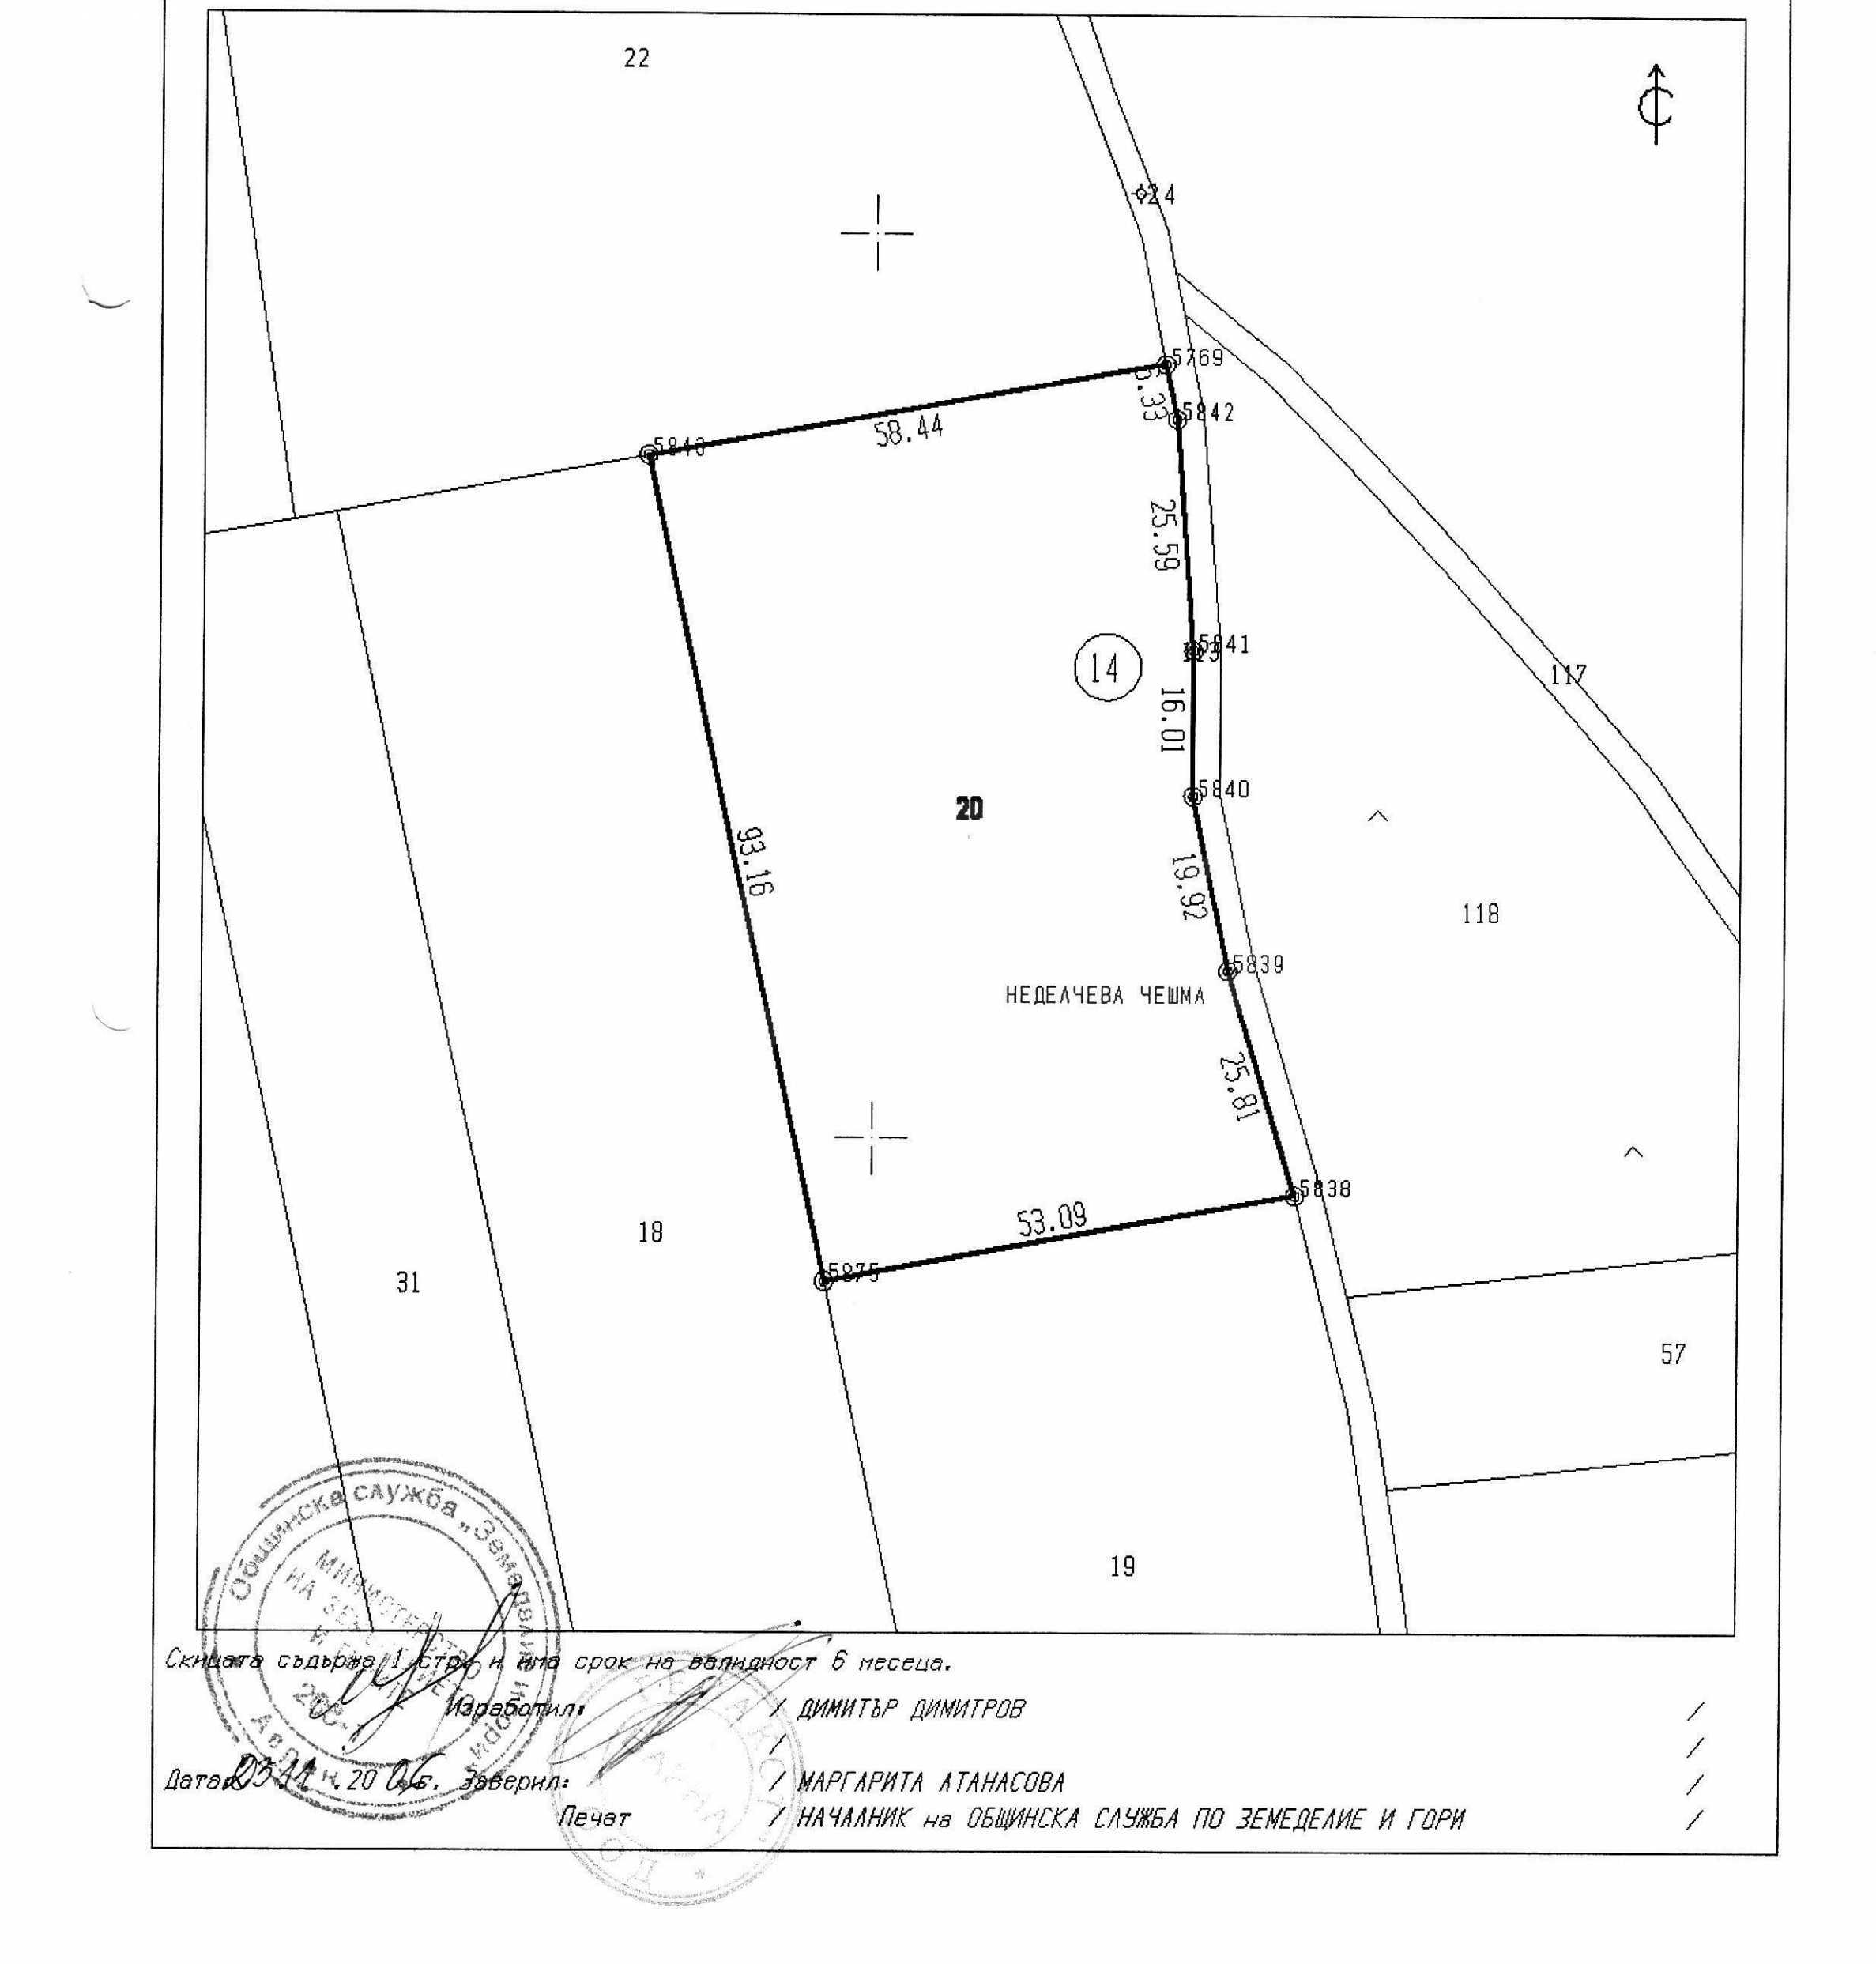 Development land in Zdravets 1